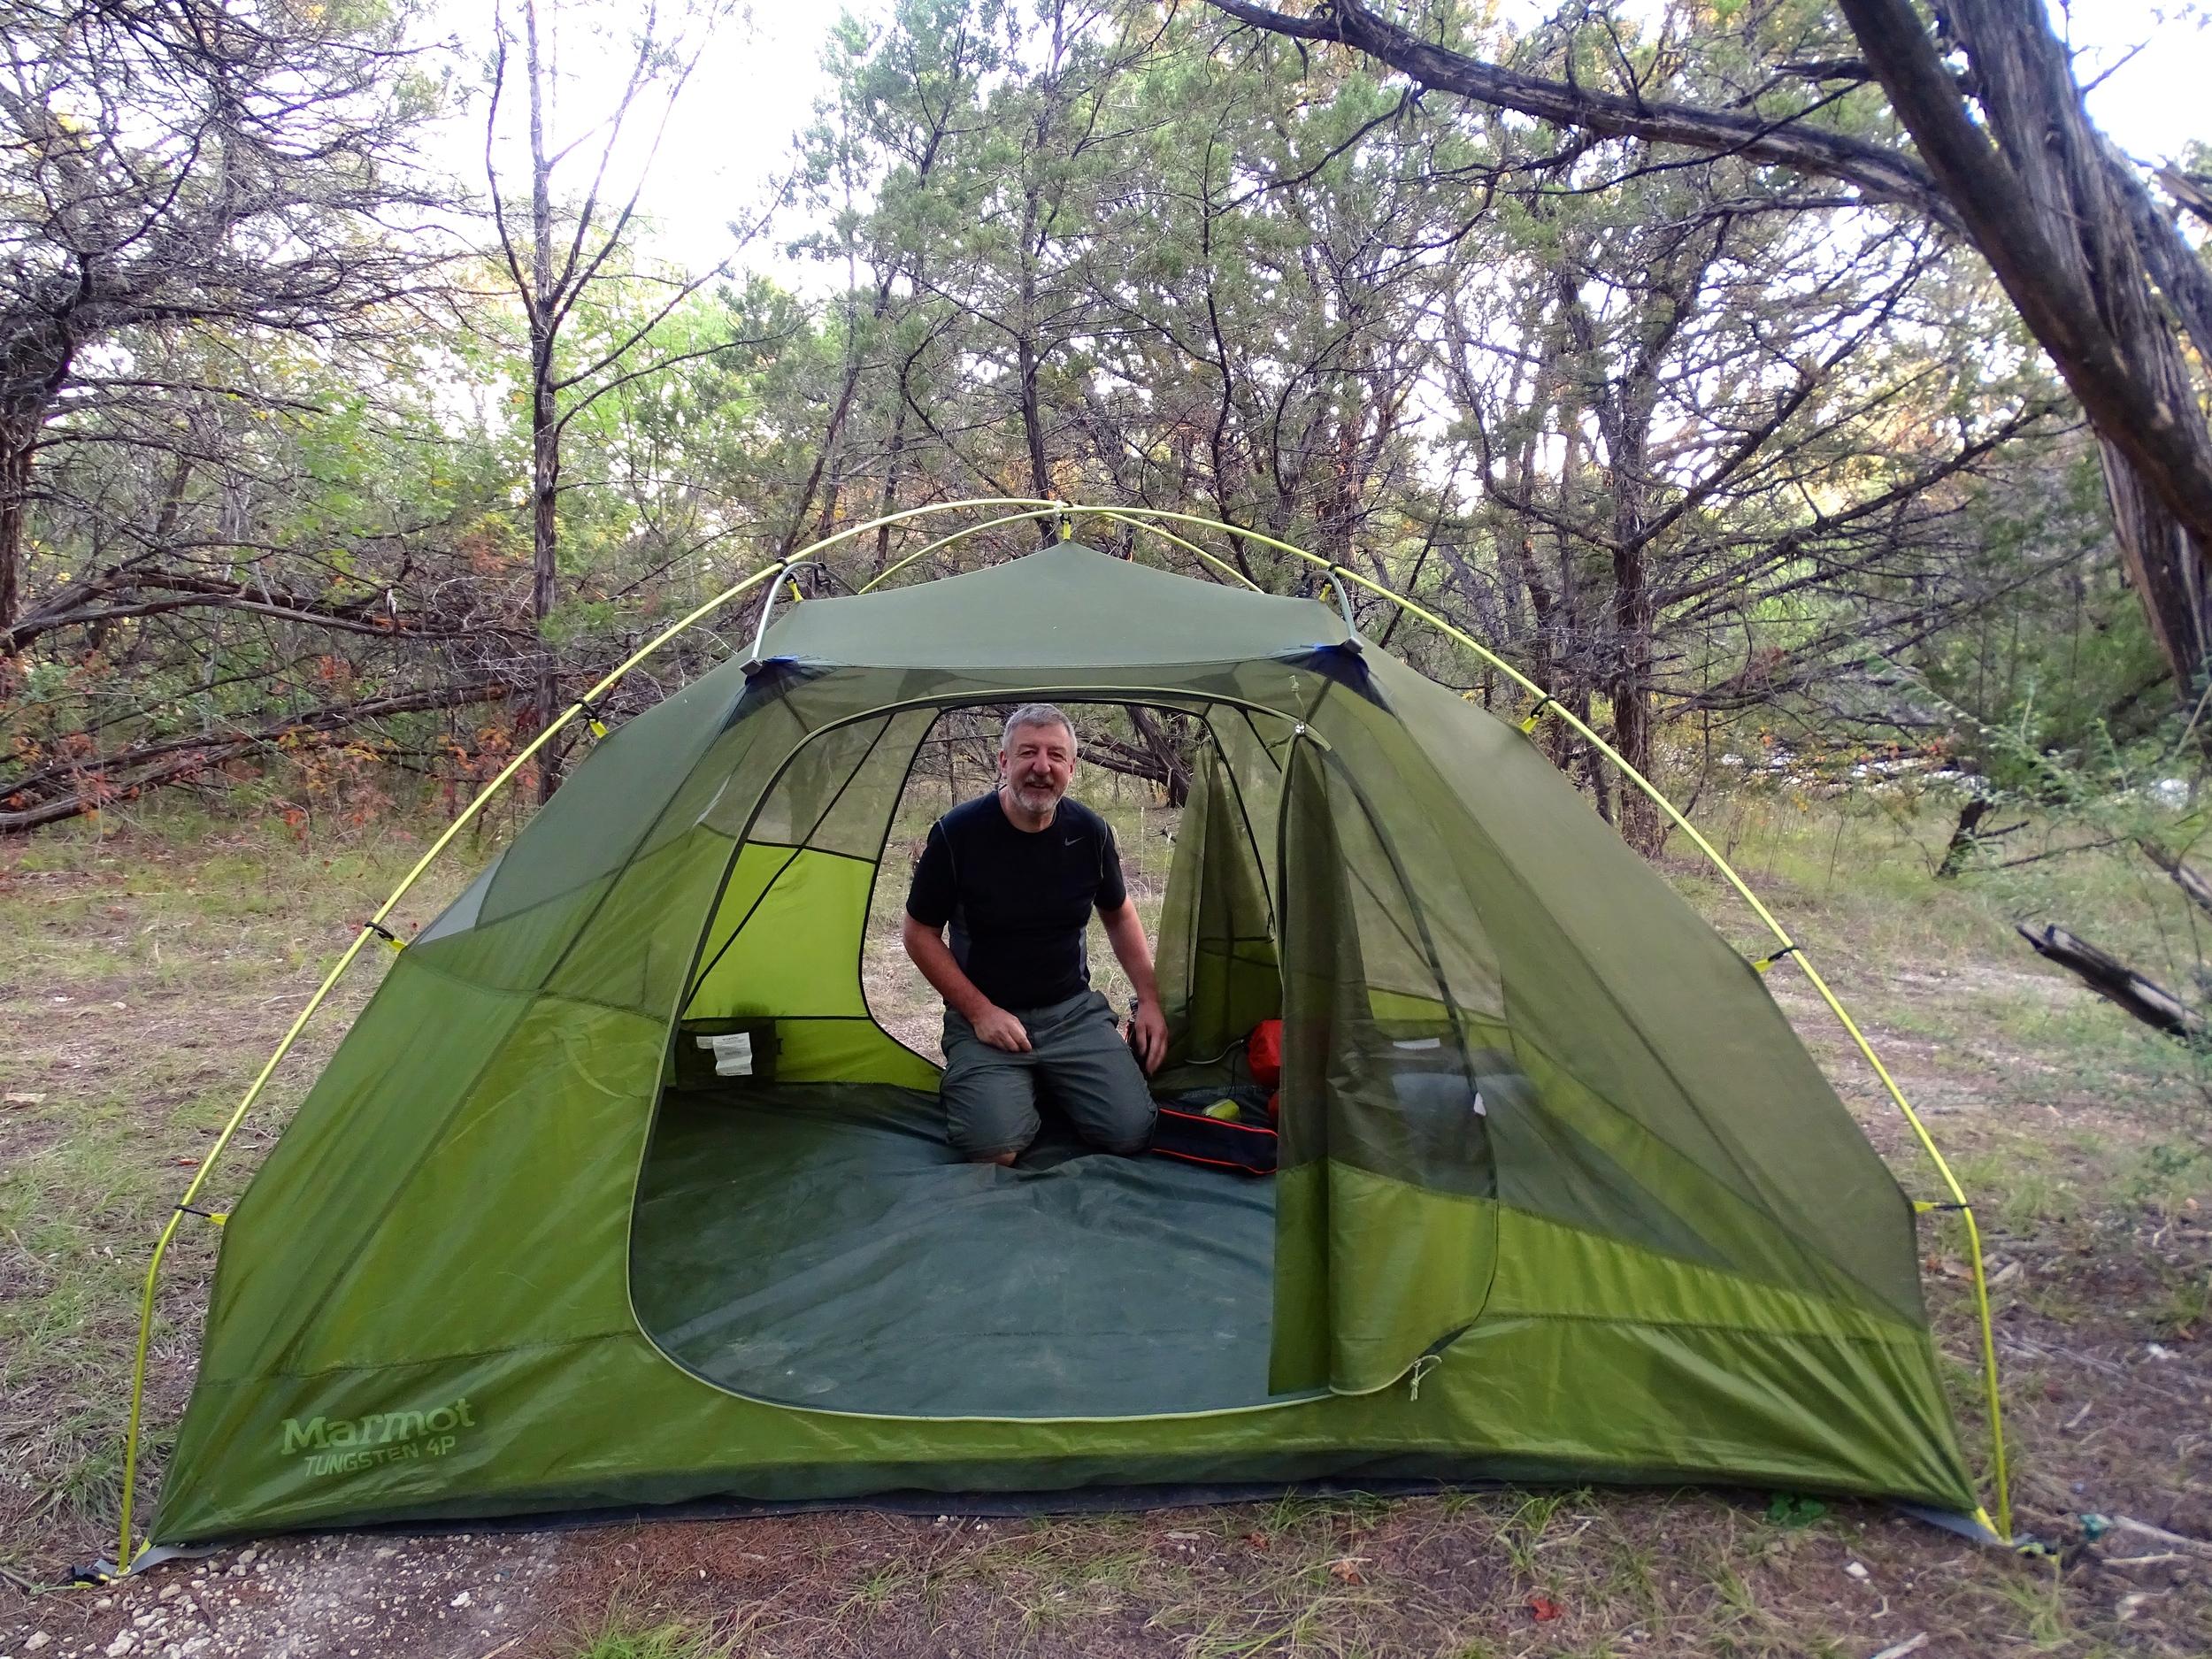 Settin' up camp.